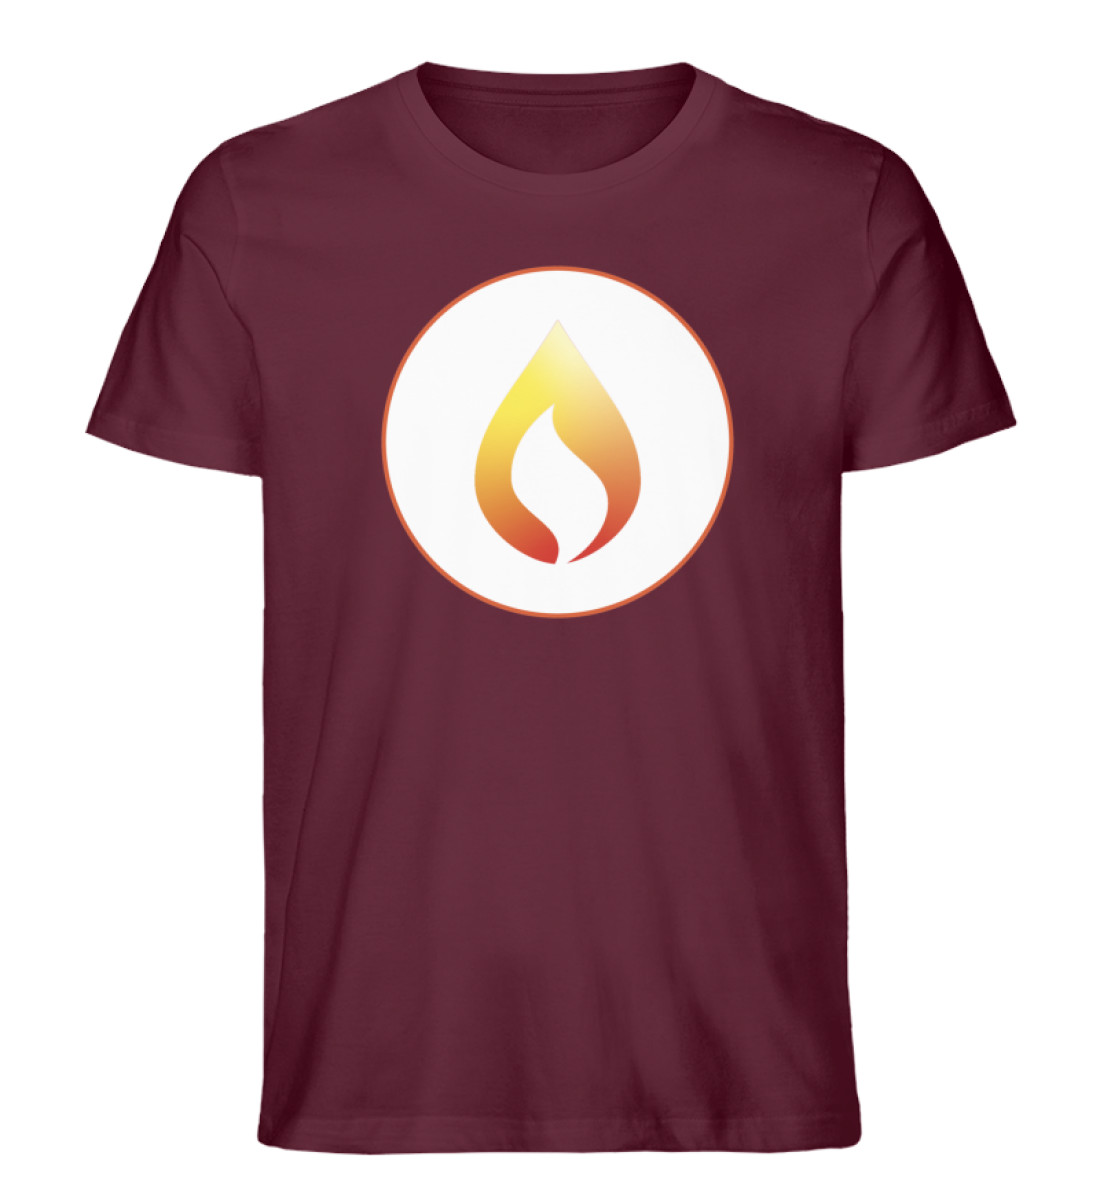 fullstop-dark - Men Premium Organic Shirt-839